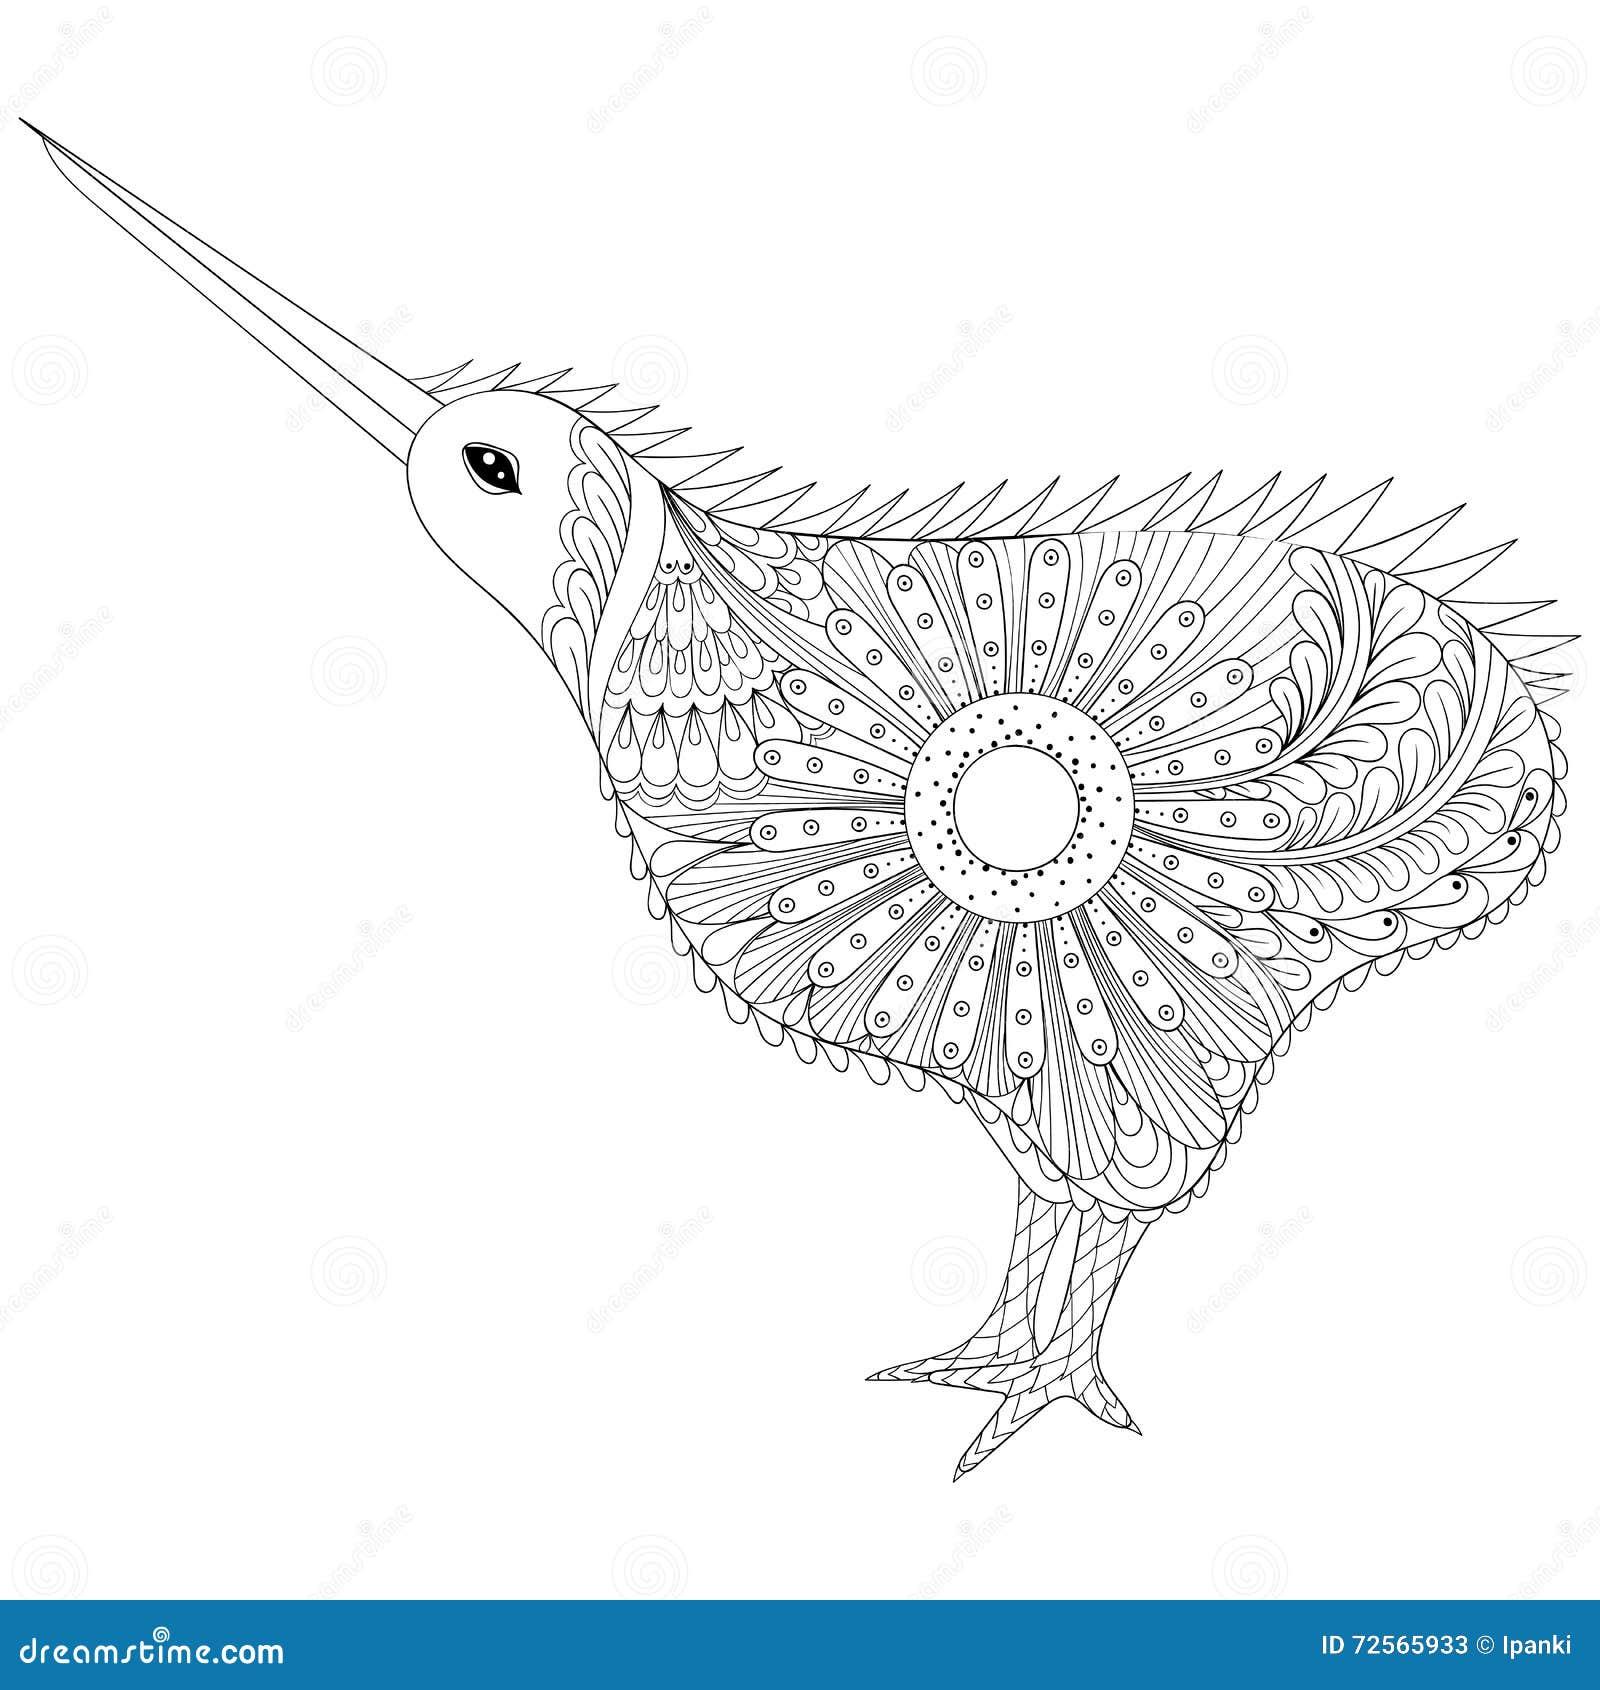 Hand Drawn Zentangle Tribal Kiwi Bird Symbol Of New Zealand For